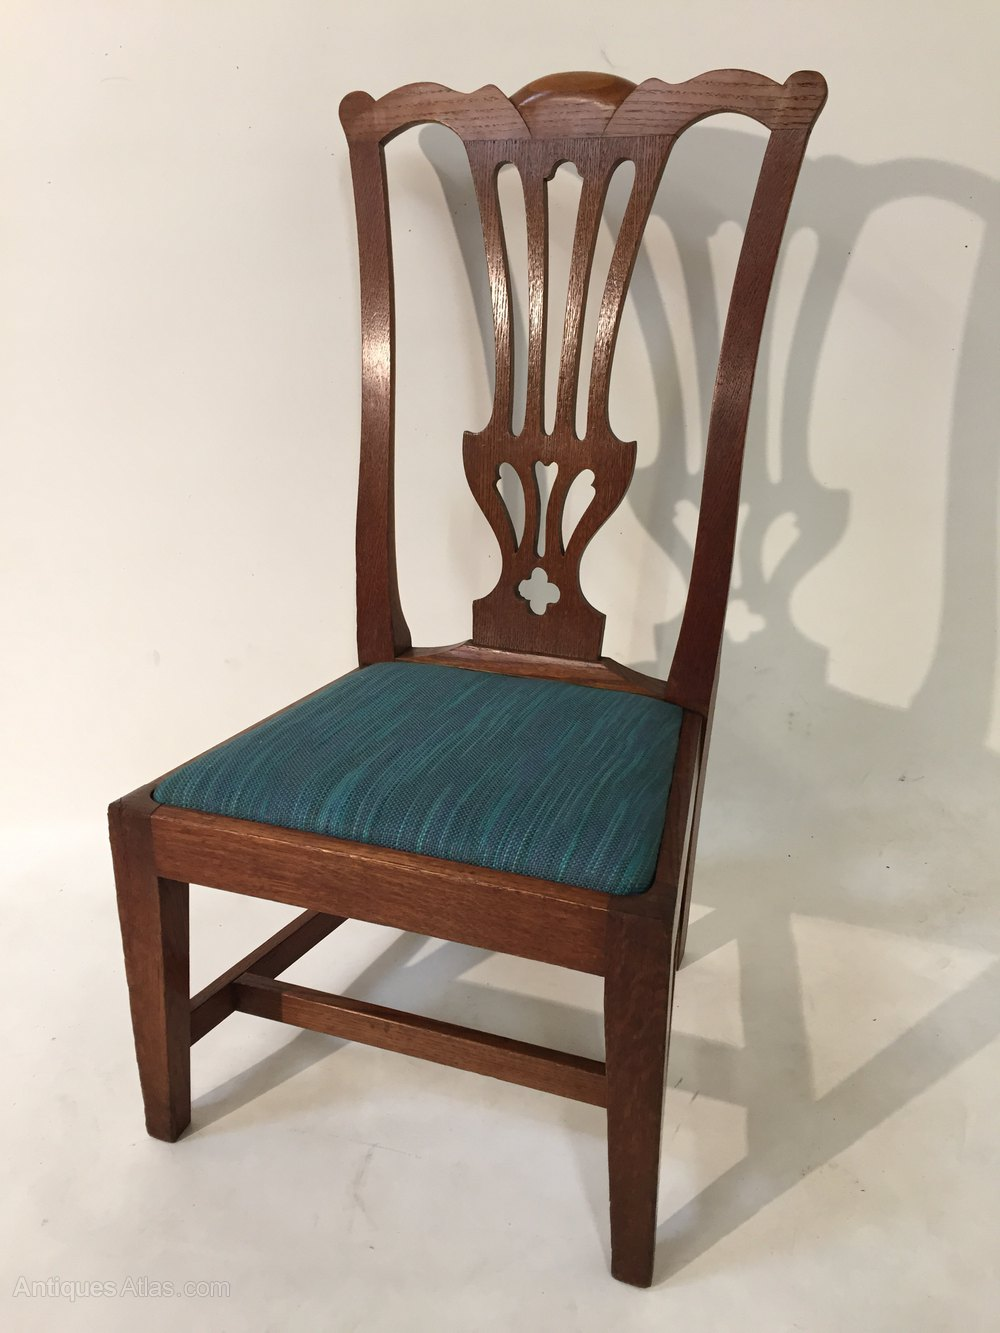 Wheeler Arncroach Gossip Chair Antique ... - Wheeler Arncroach Gossip Chair - Antiques Atlas